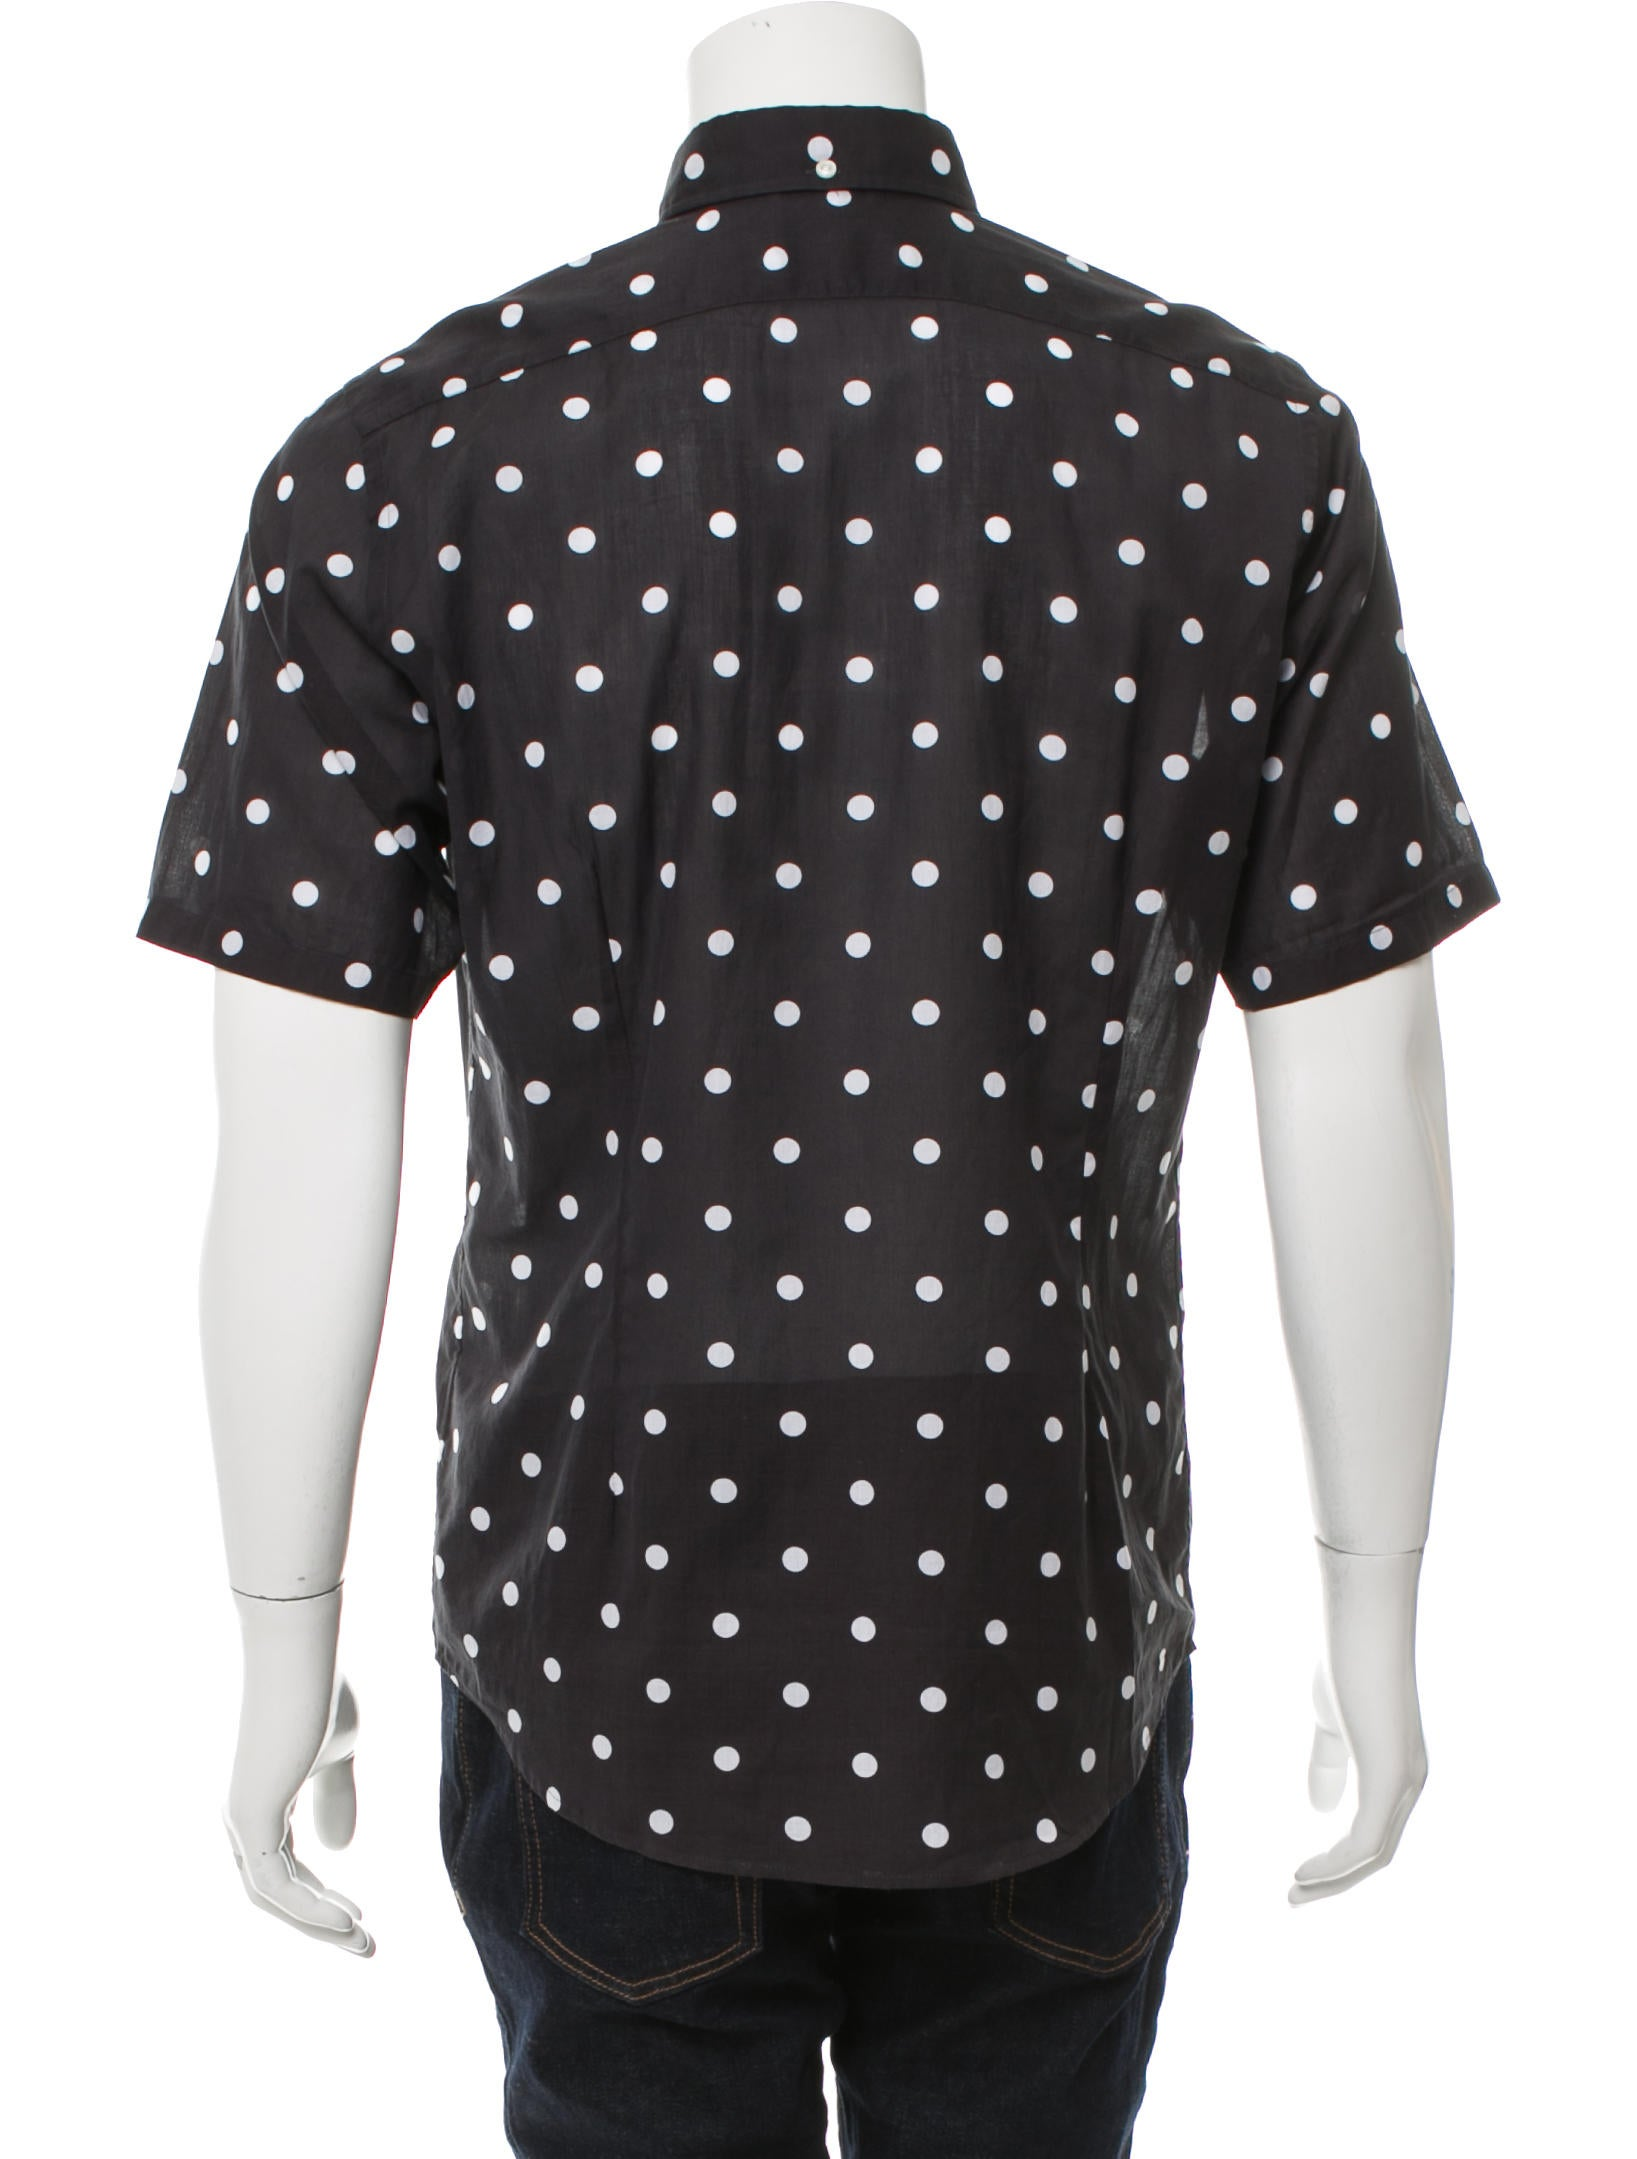 Eton Polka Dot Button Up Shirt W Tags Clothing